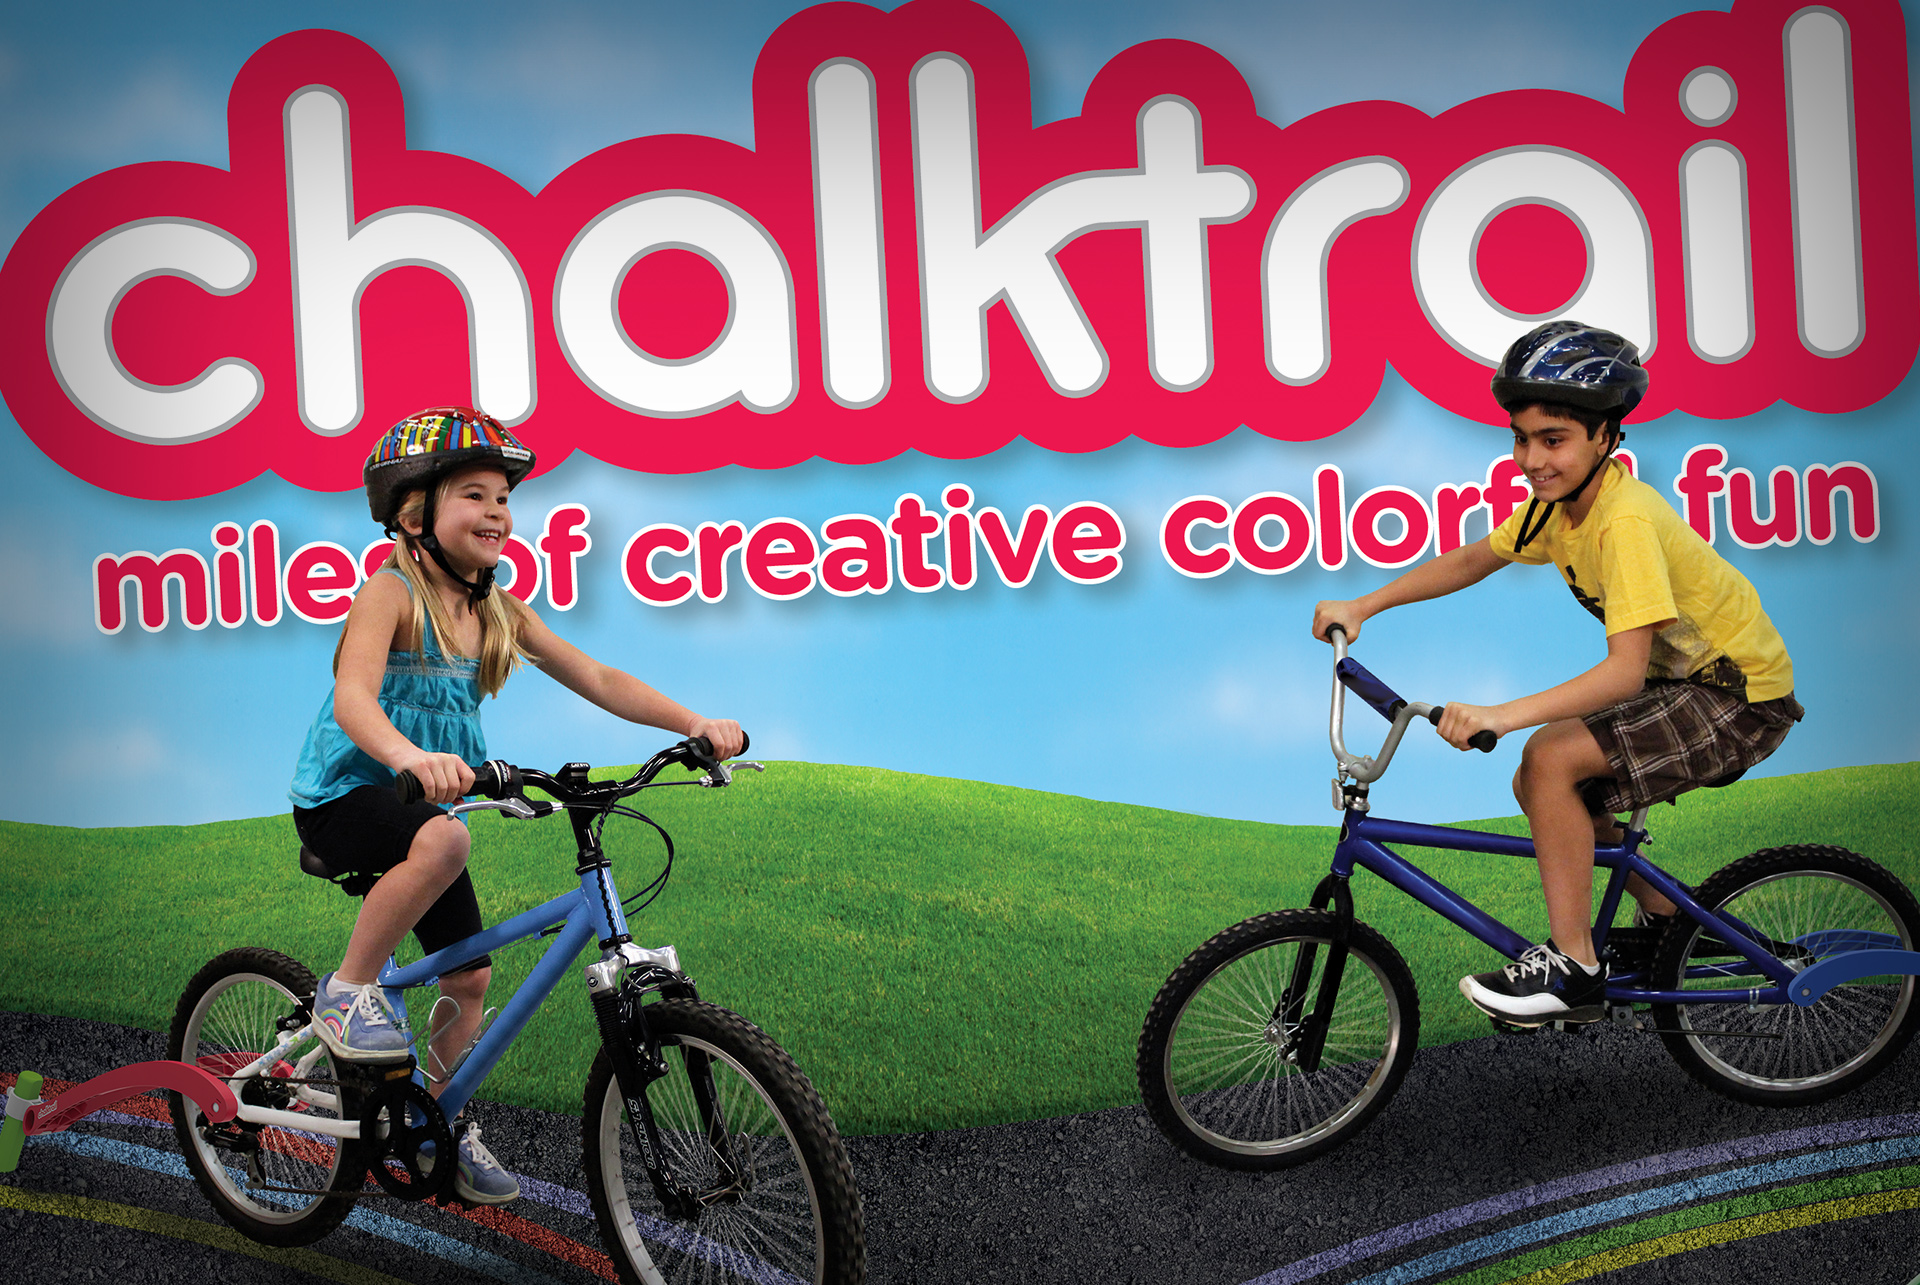 chalktrail_feature